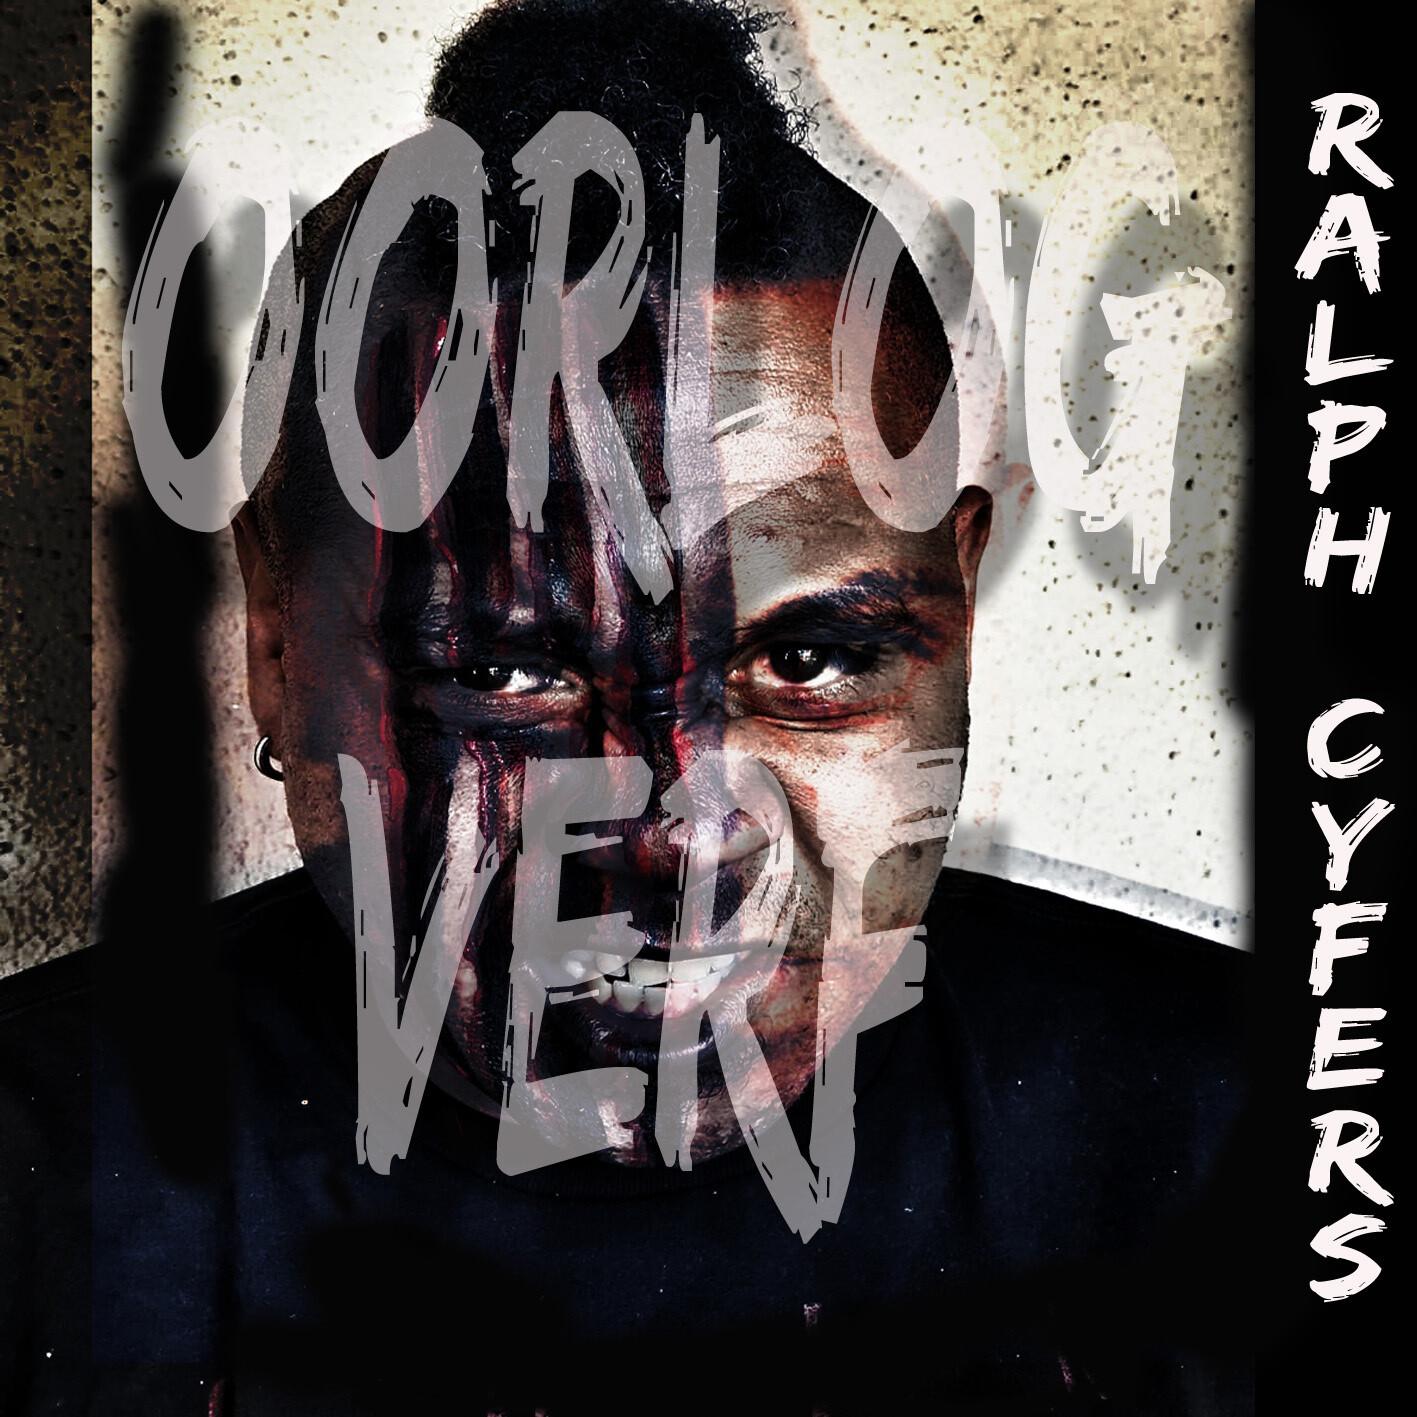 Ralph Cyfers - Oorlog Verf Album